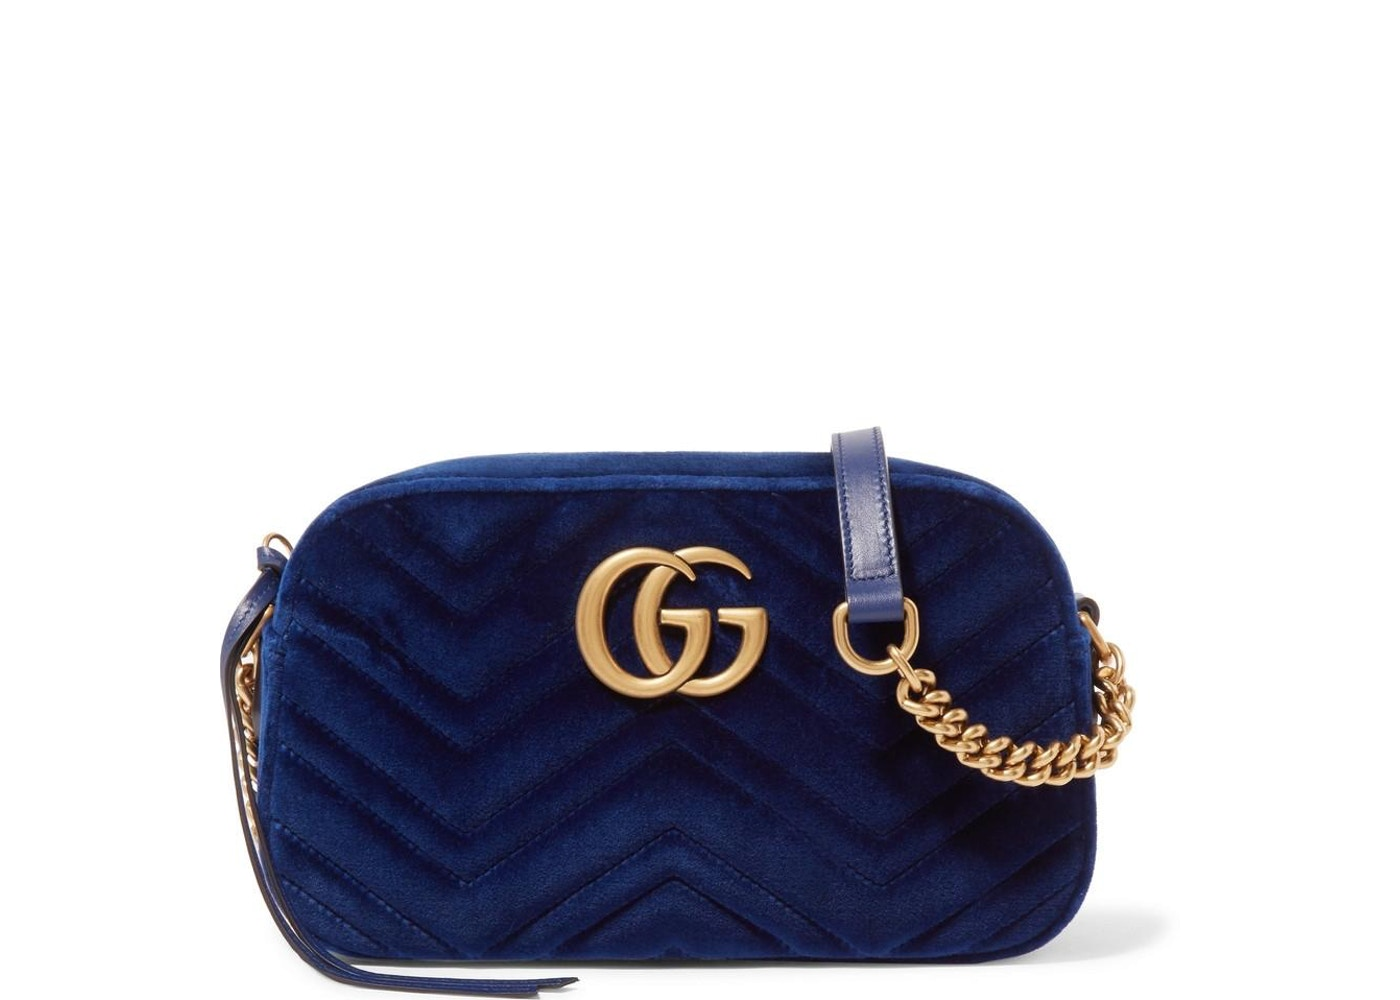 07046675aa7a Gucci Marmont Matelasse Crossbody Velvet Small Cobalt Blue